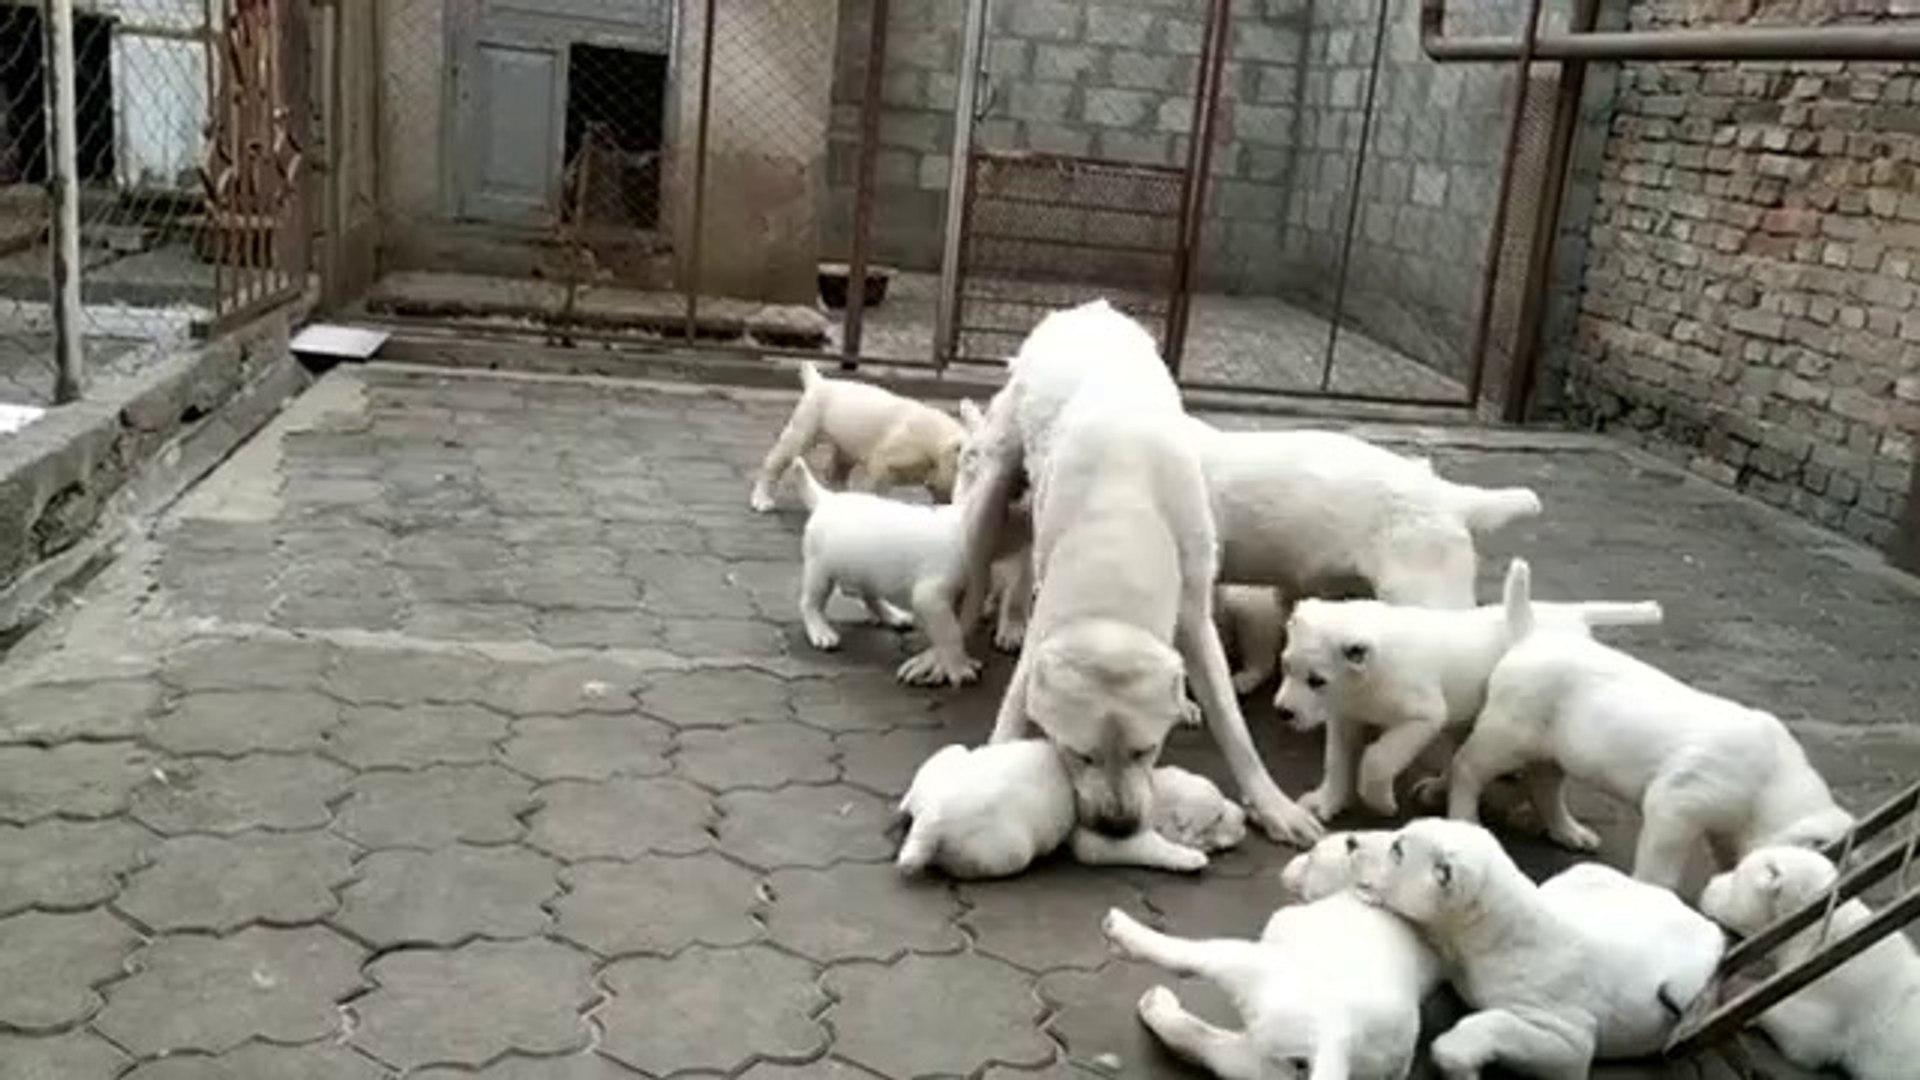 ALABAY YAVRULARININ KAHVALTI YARISI - ALABAi SHEPHERD DOG PUPPiES